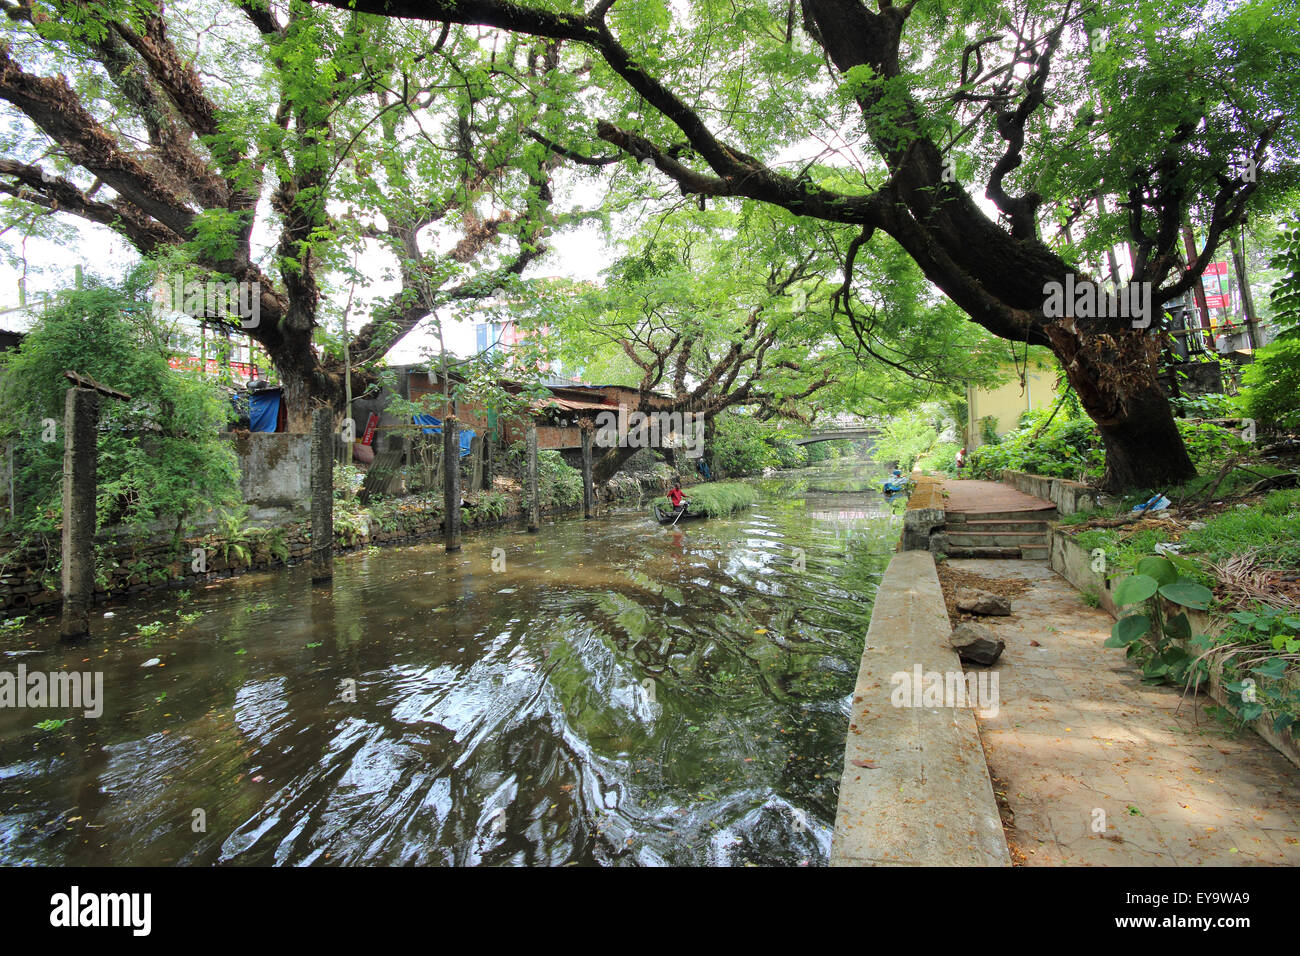 Alleppey, Kerala, India Immagini Stock